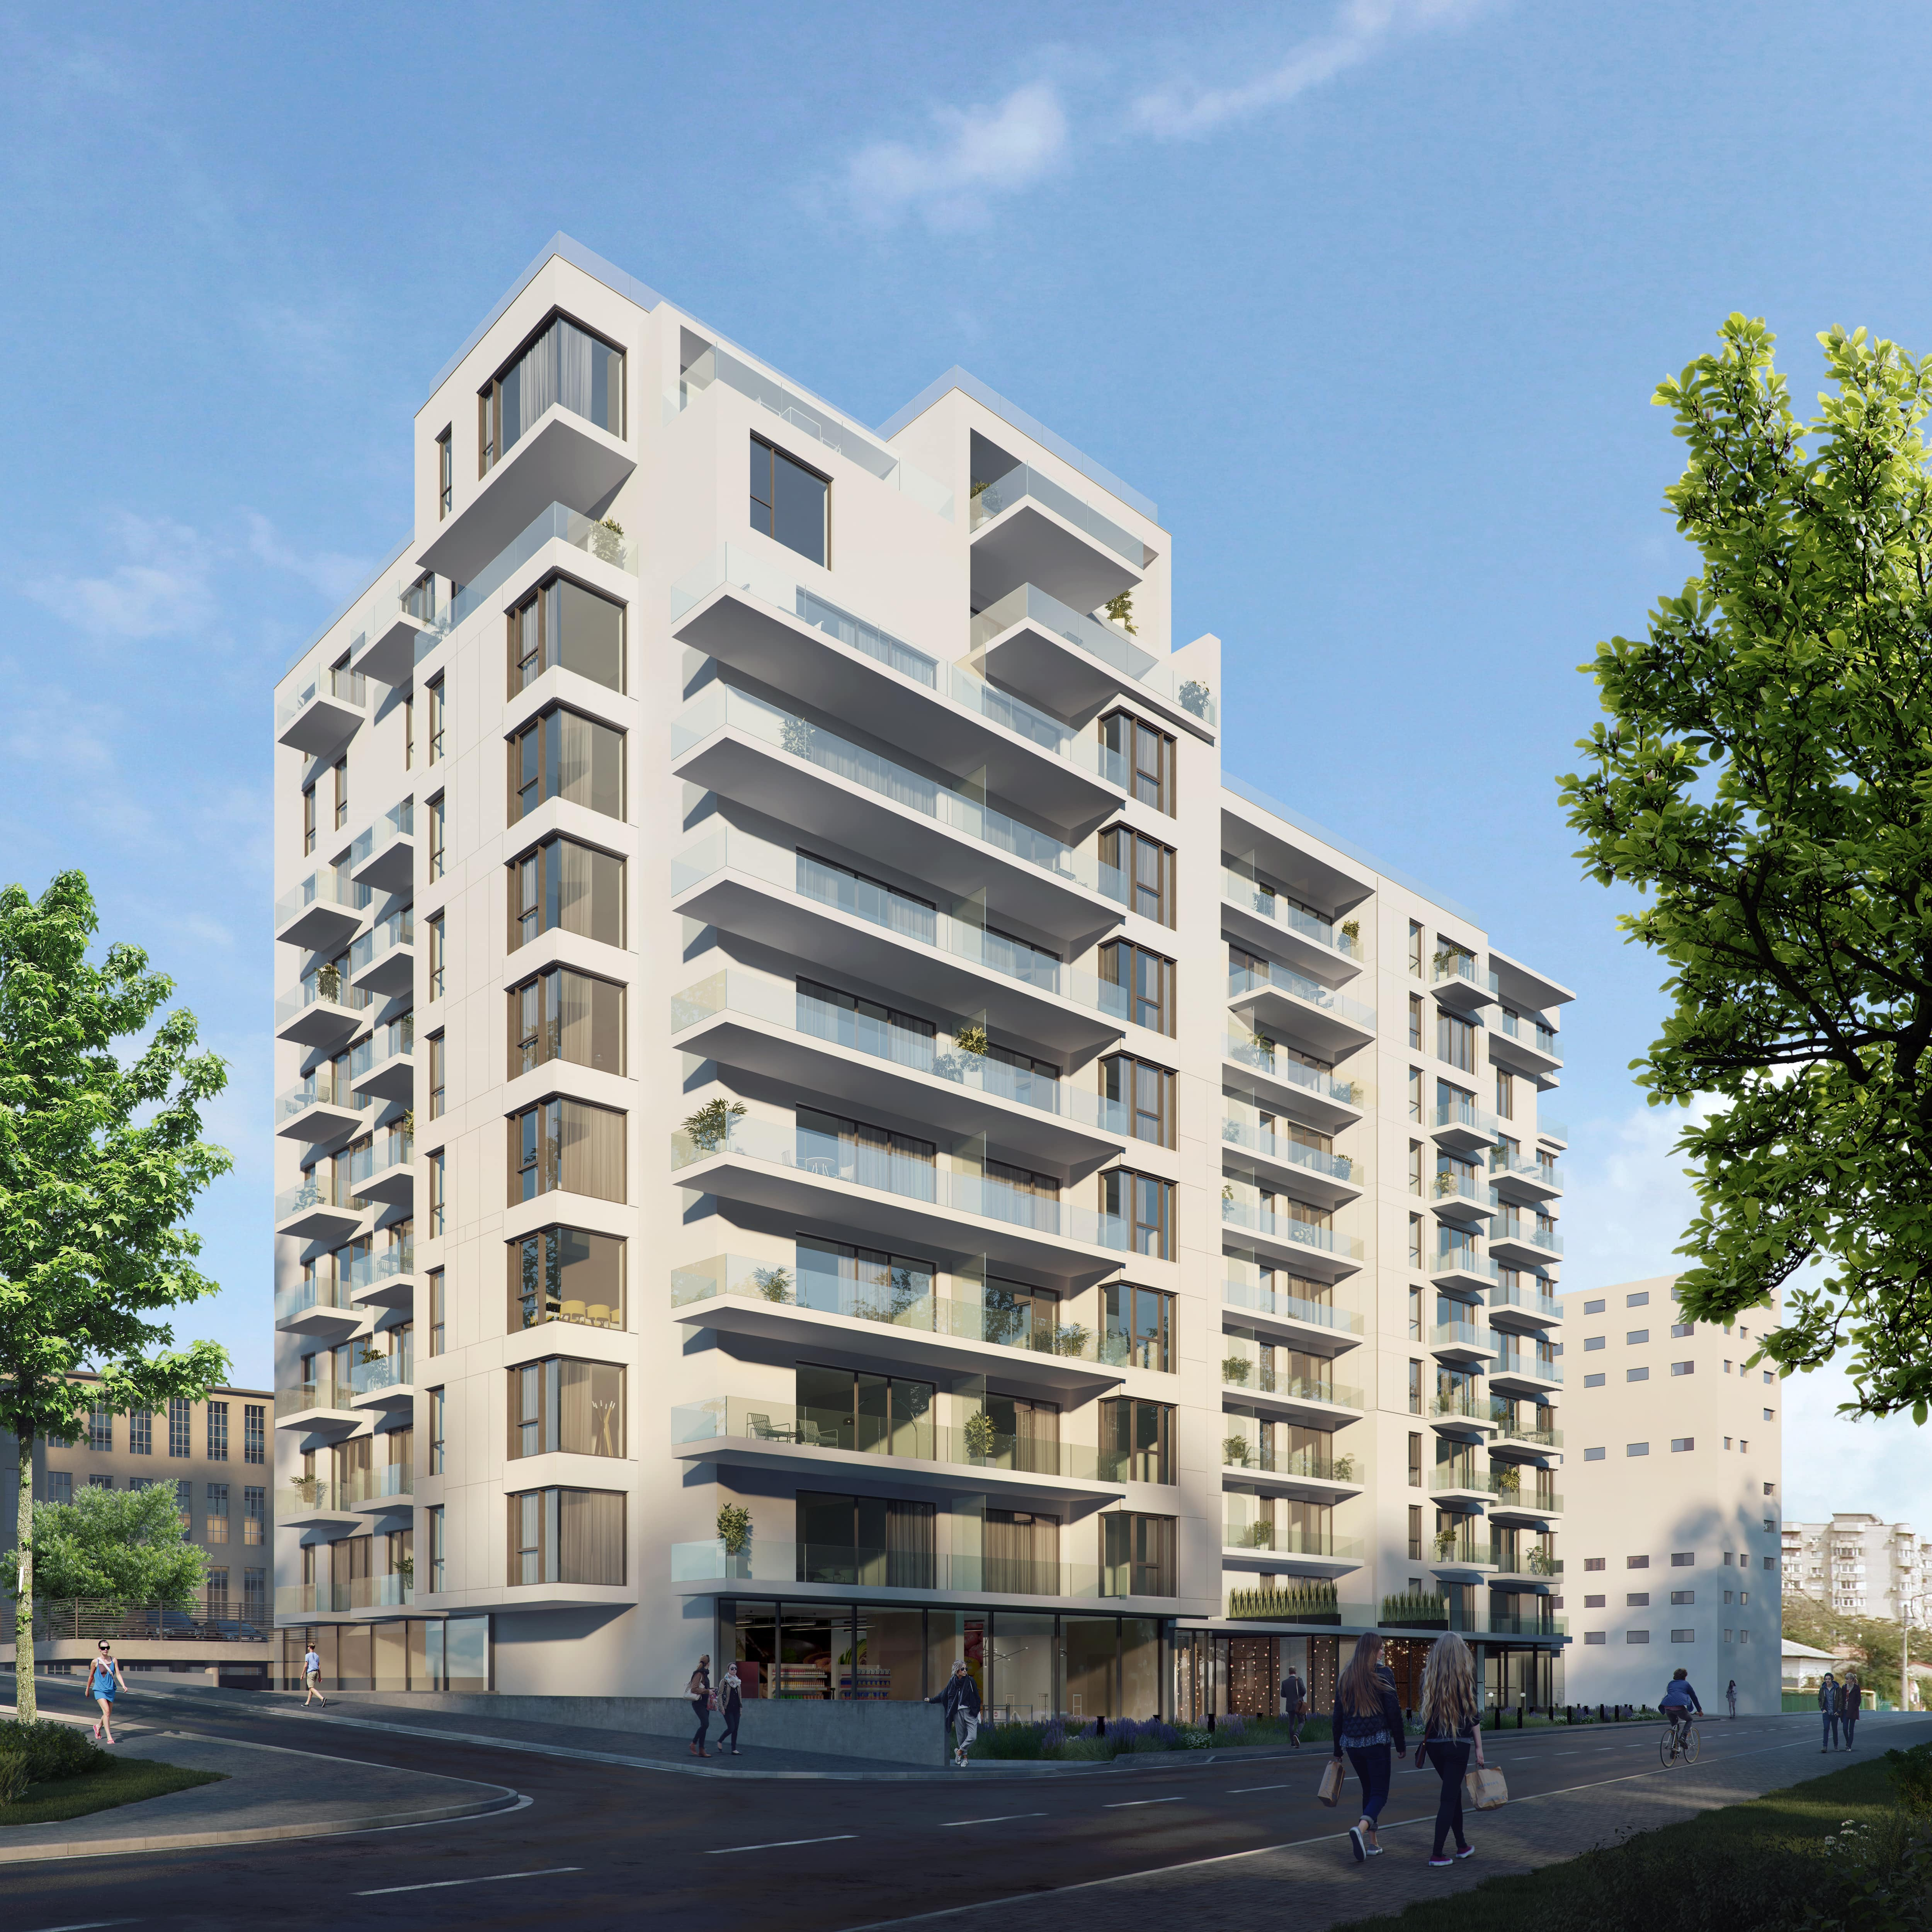 https://ahe-ro.s3.amazonaws.com/10792/penthouse-si-apartamente-unirii-%286%29.jpg